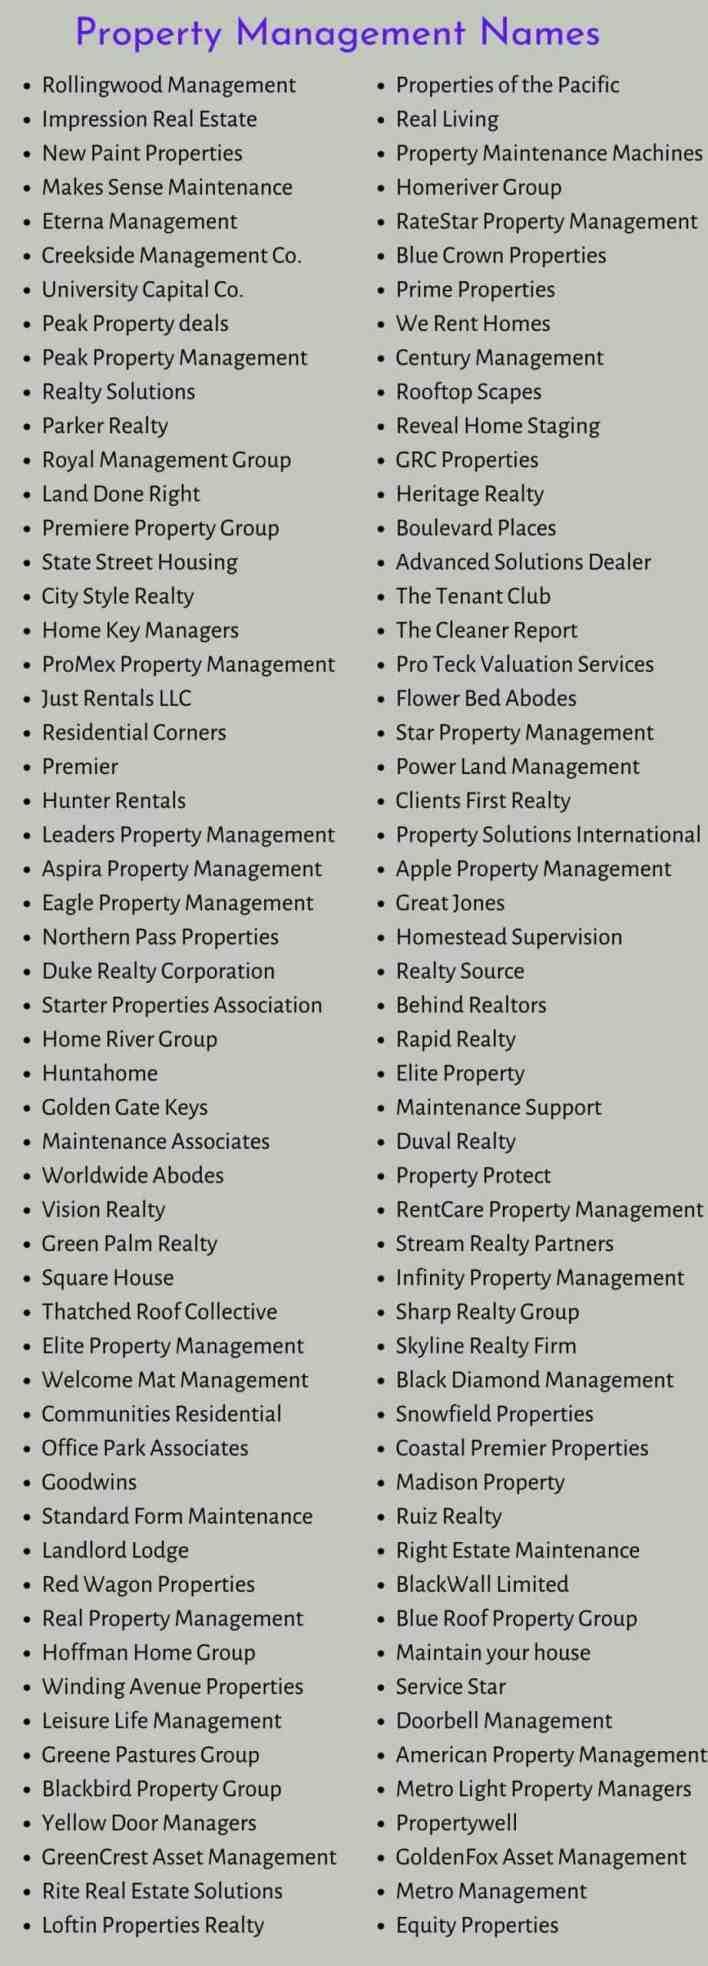 Property Management Names